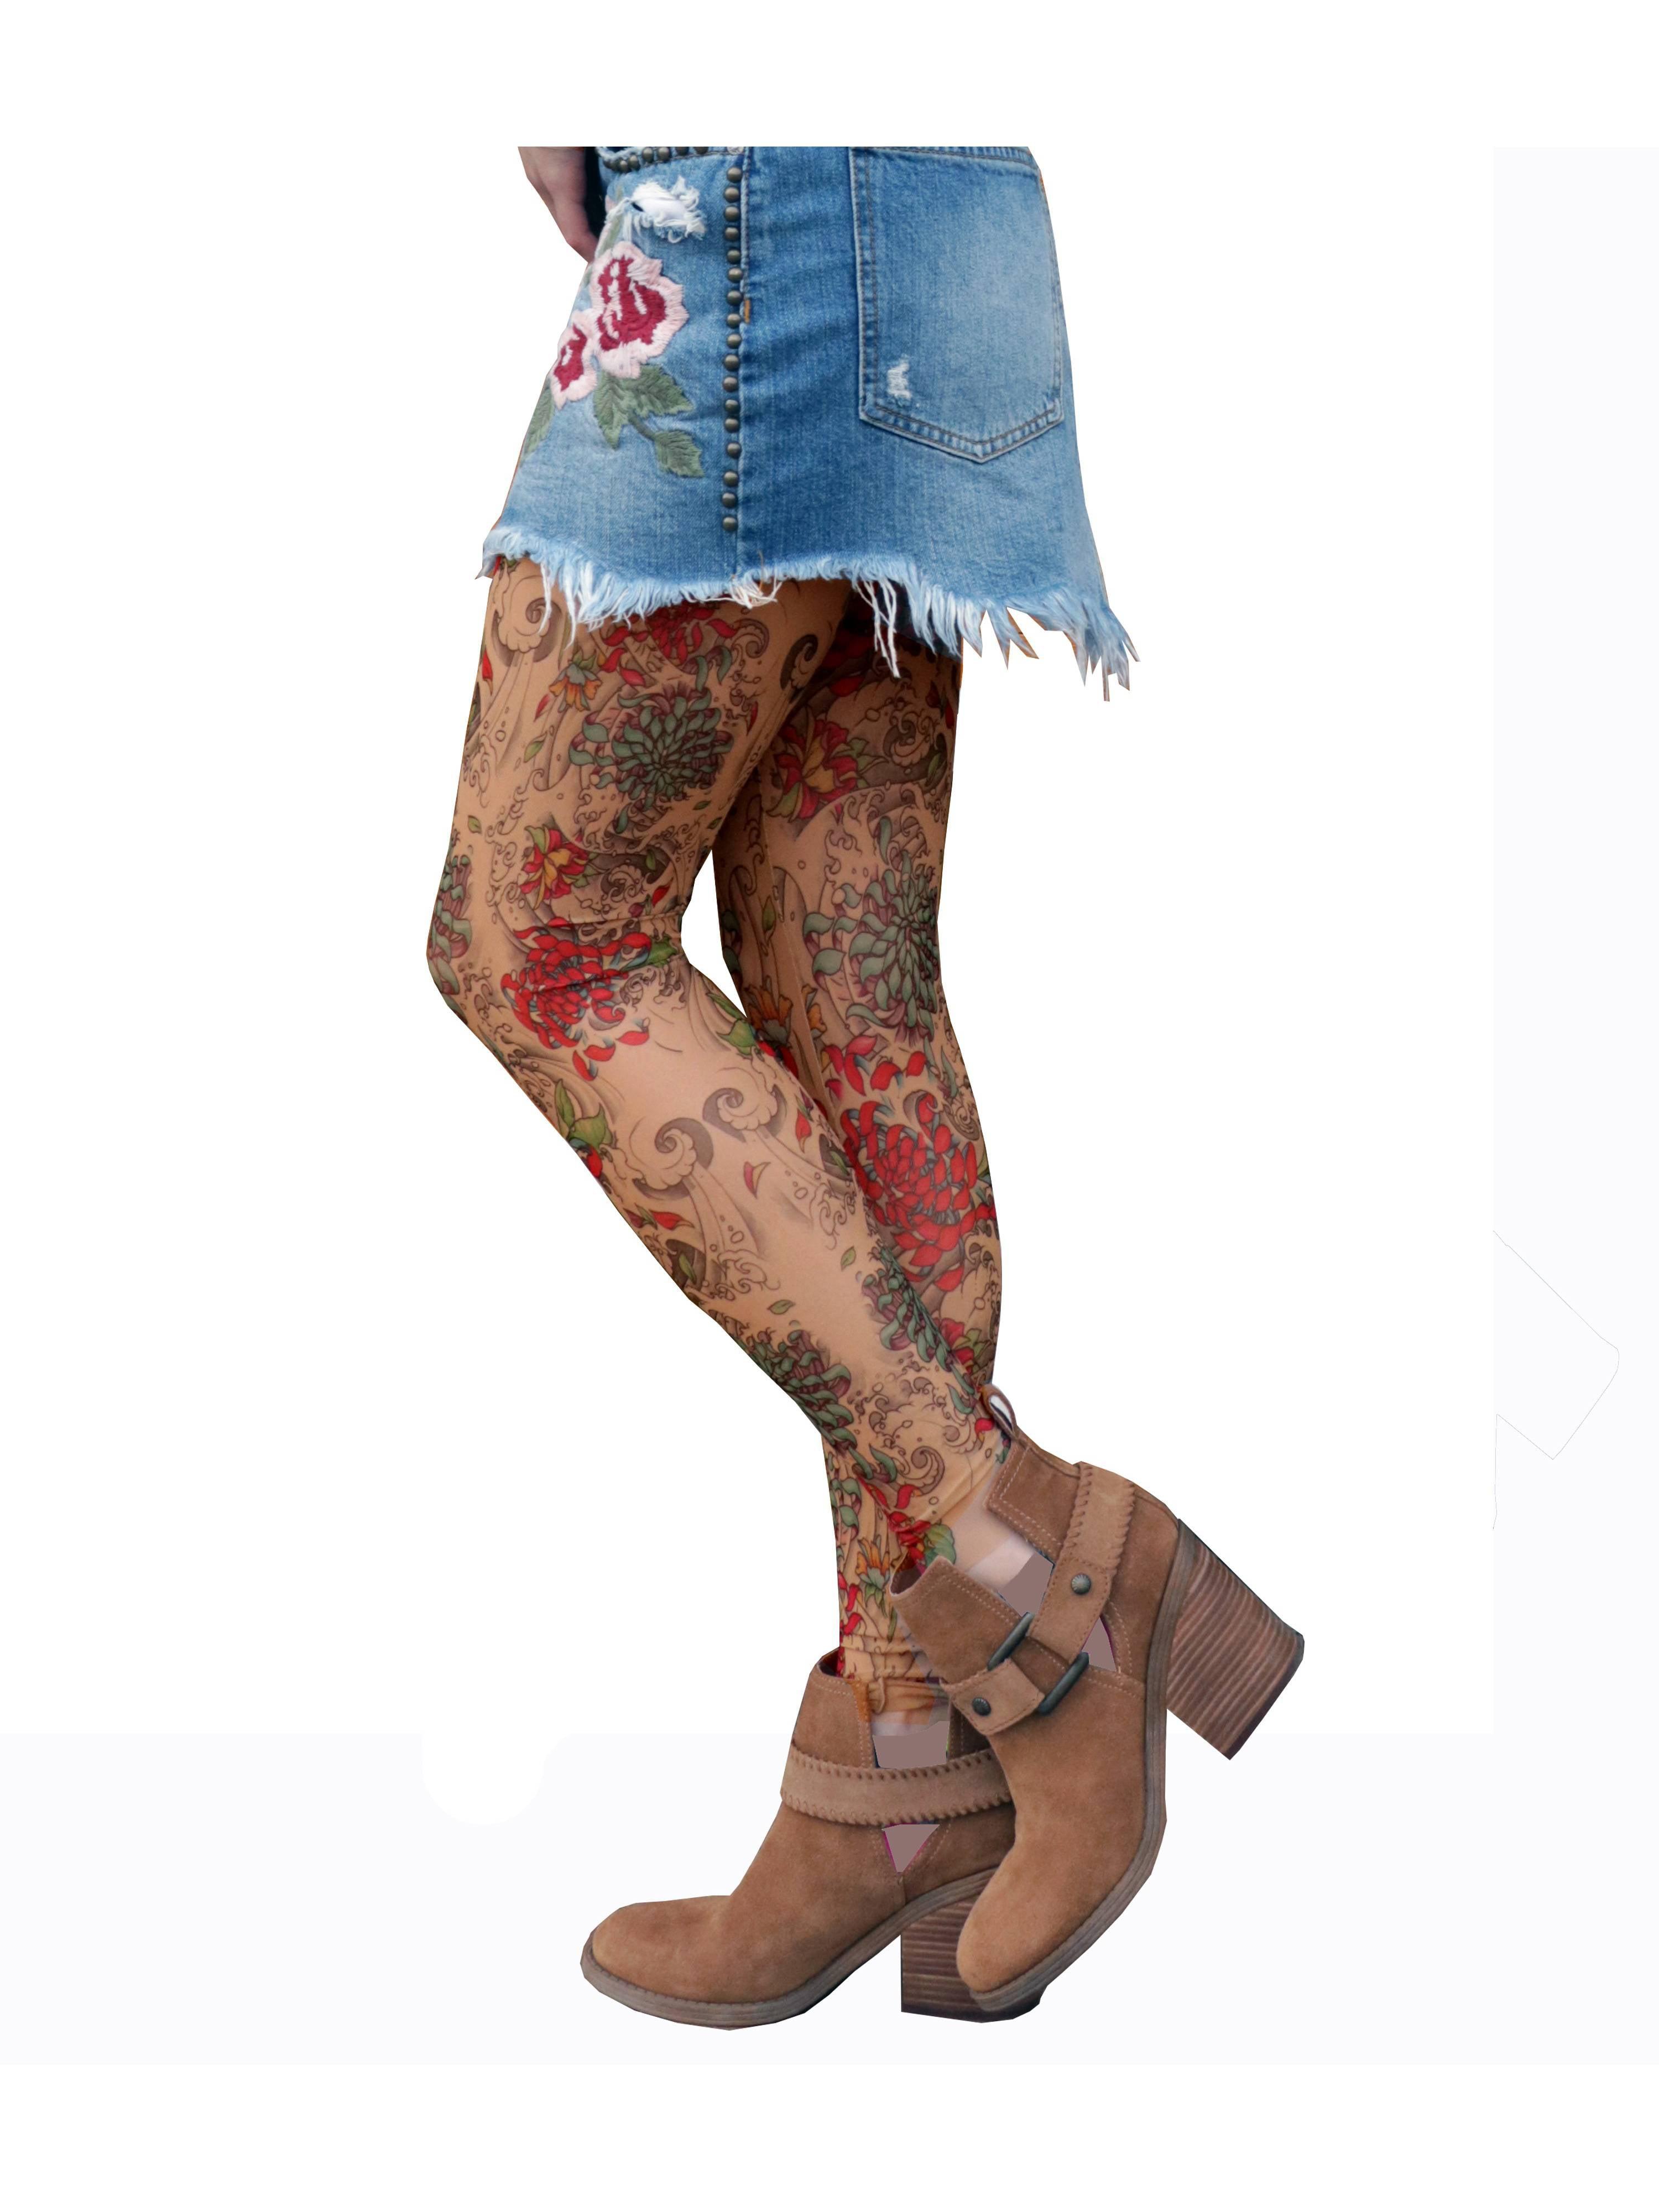 Mums in tights Wild Rose Tattoo Wild Rose Ladies Mums Tattoo Leggings Chrysanthemum Pink Flowers Tan Mesh Walmart Com Walmart Com